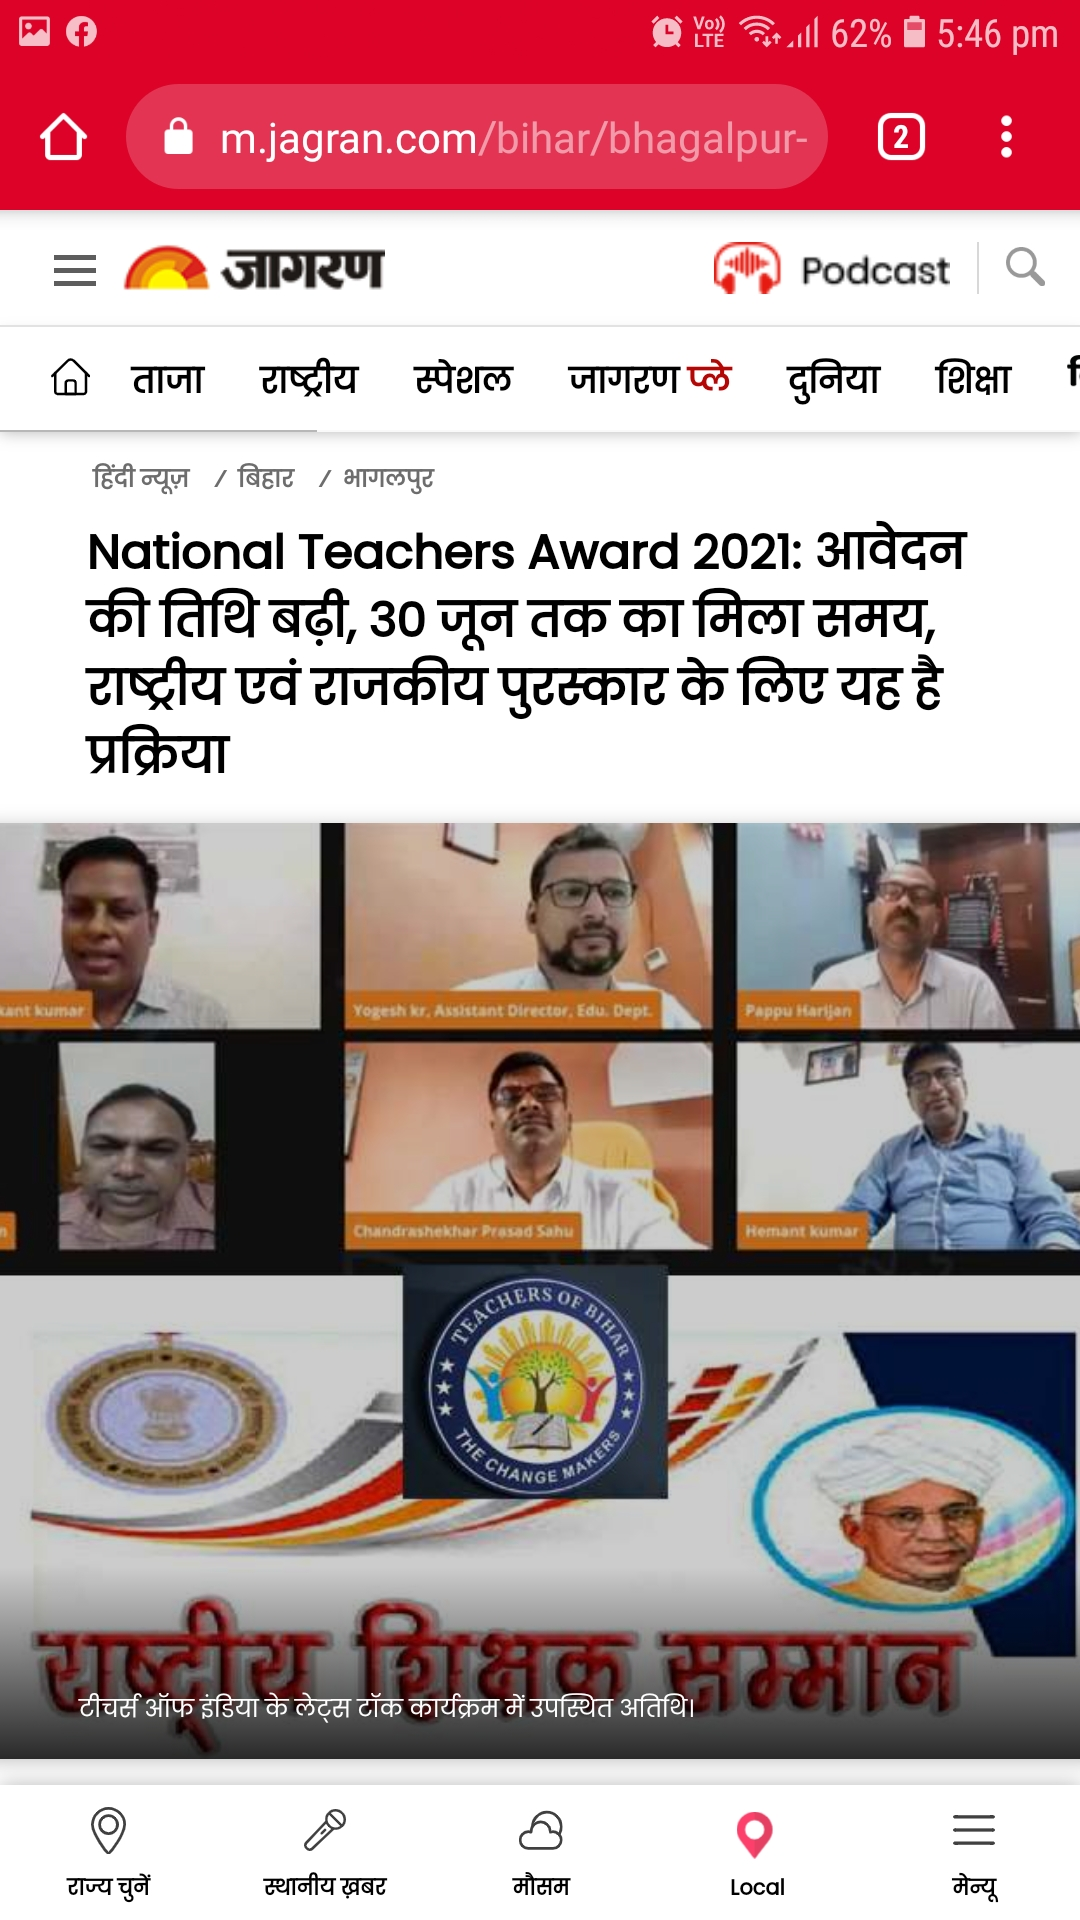 Let's Talk program on 'National Teachers Award 2021' ,Dainik Jagaran Bhagalpur